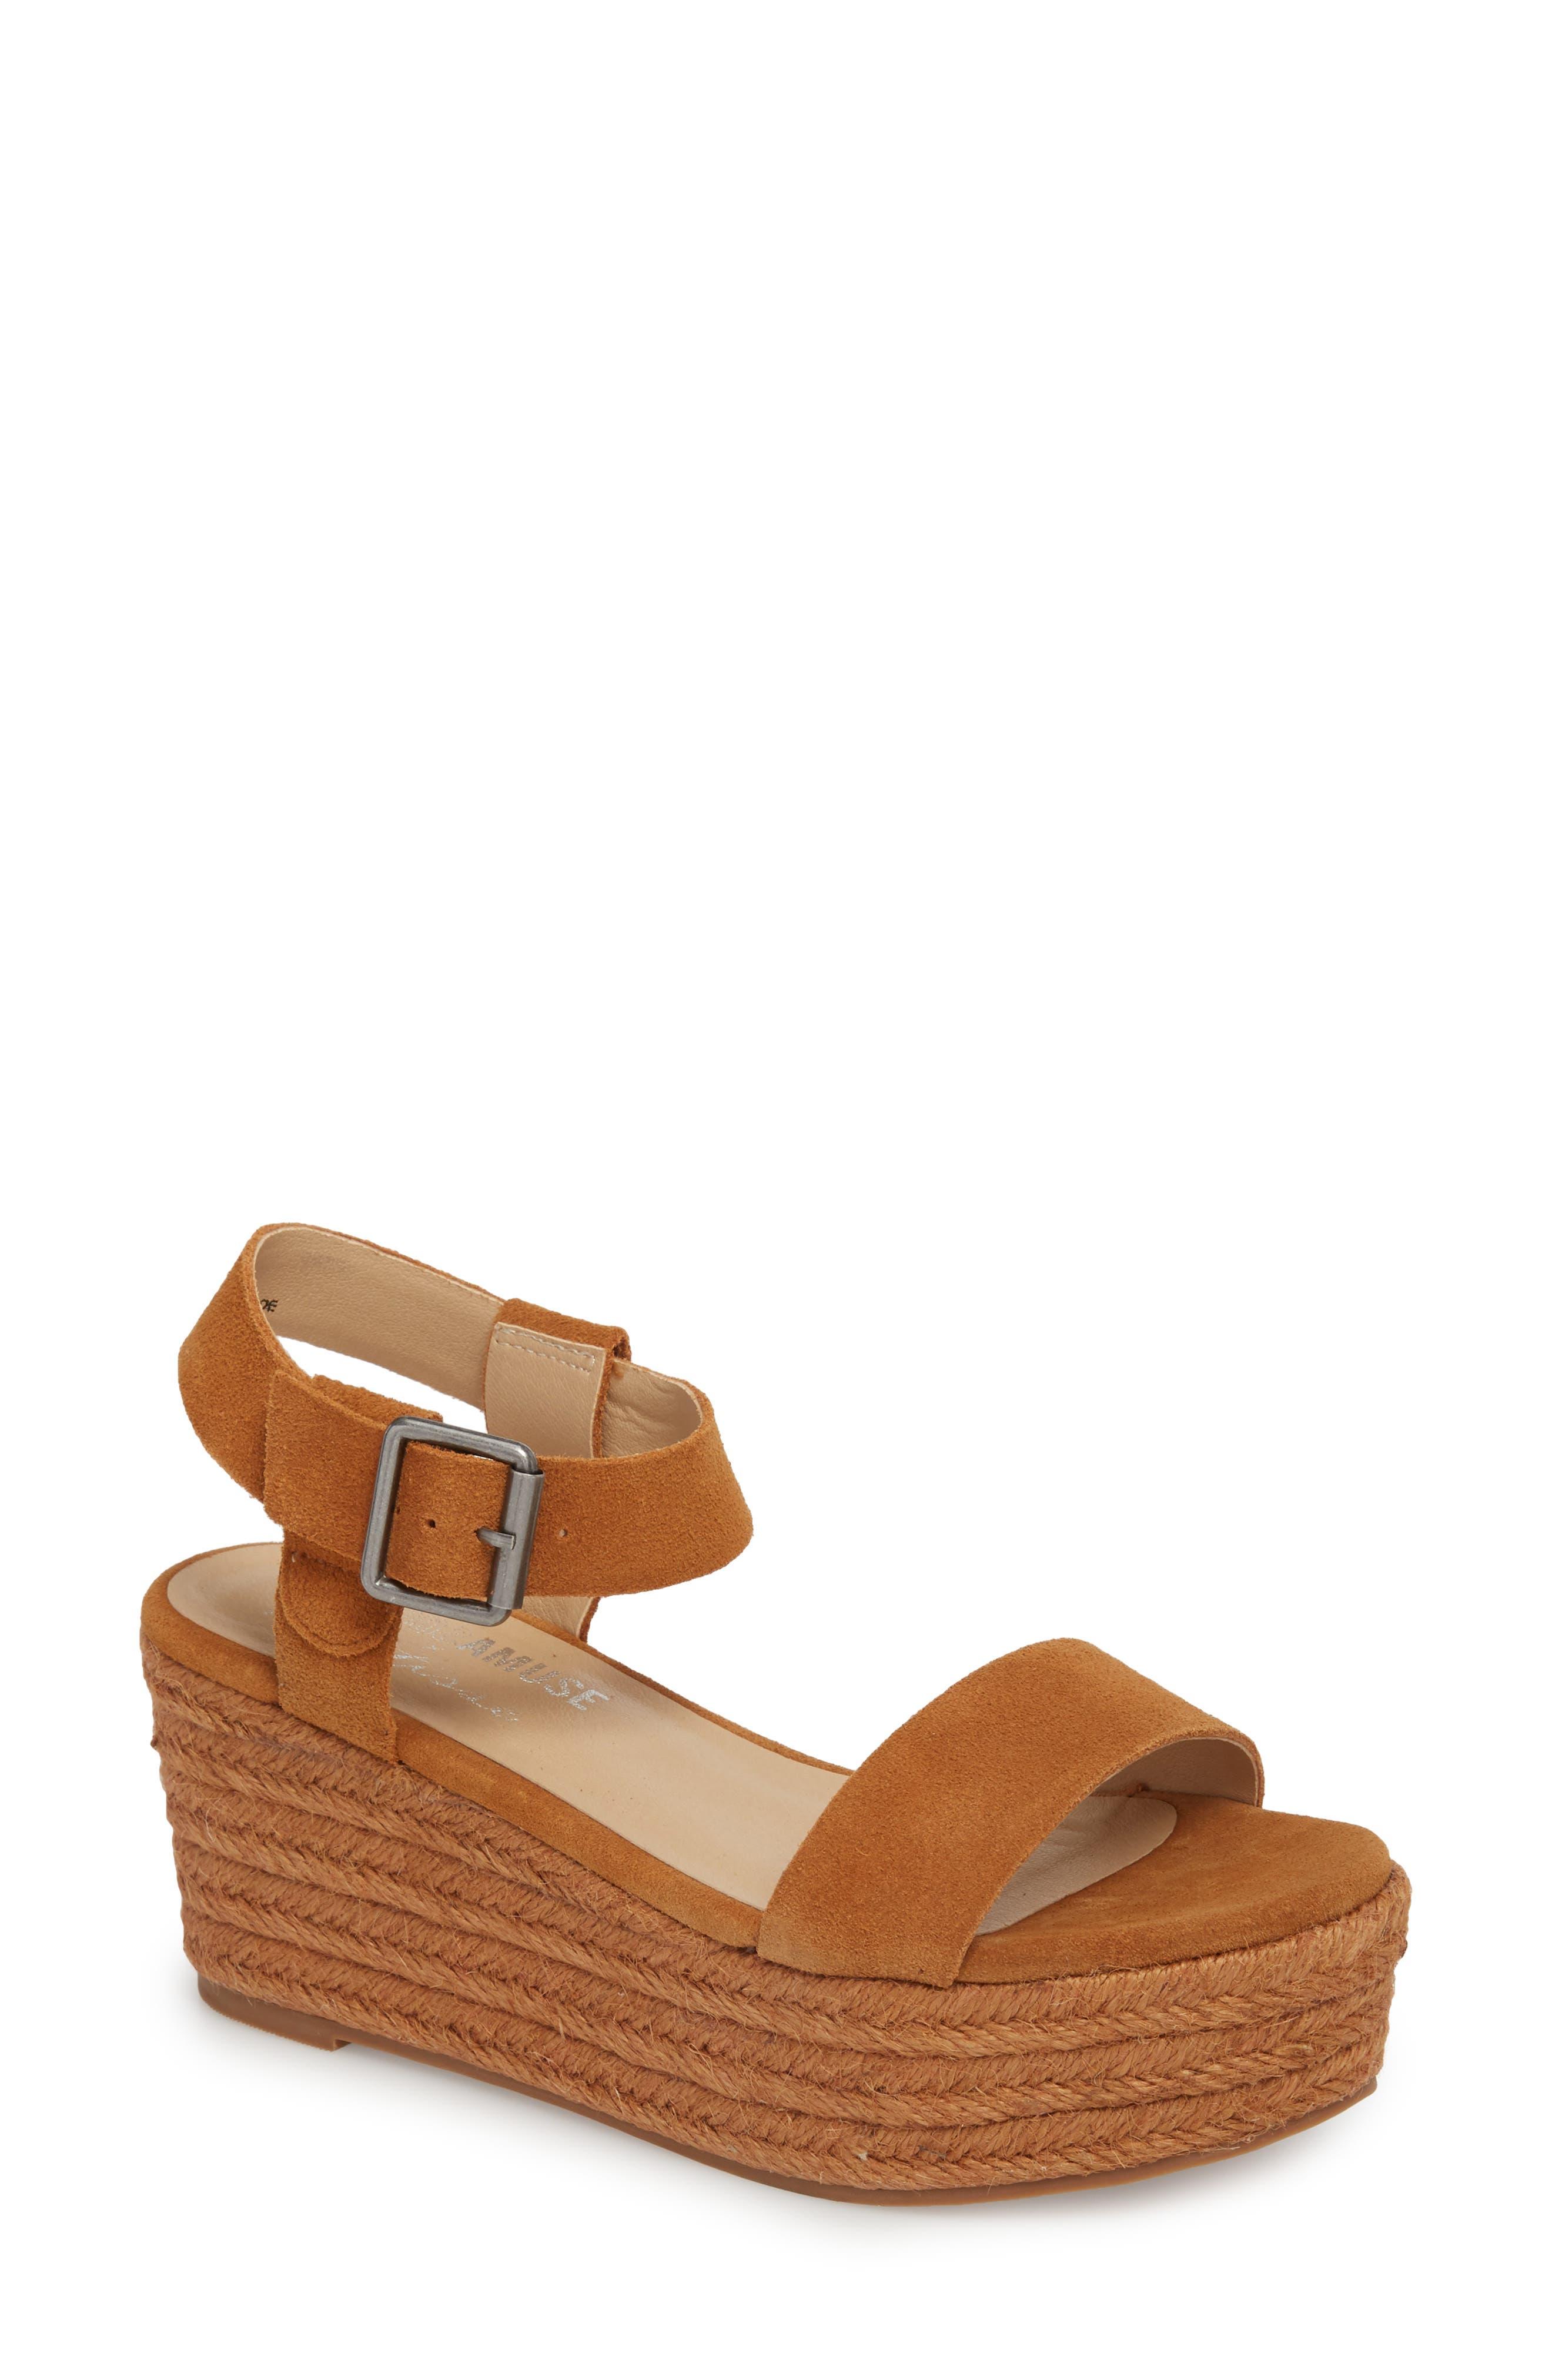 Amuse Society x Matisse Siena Wedge Sandal,                             Main thumbnail 2, color,